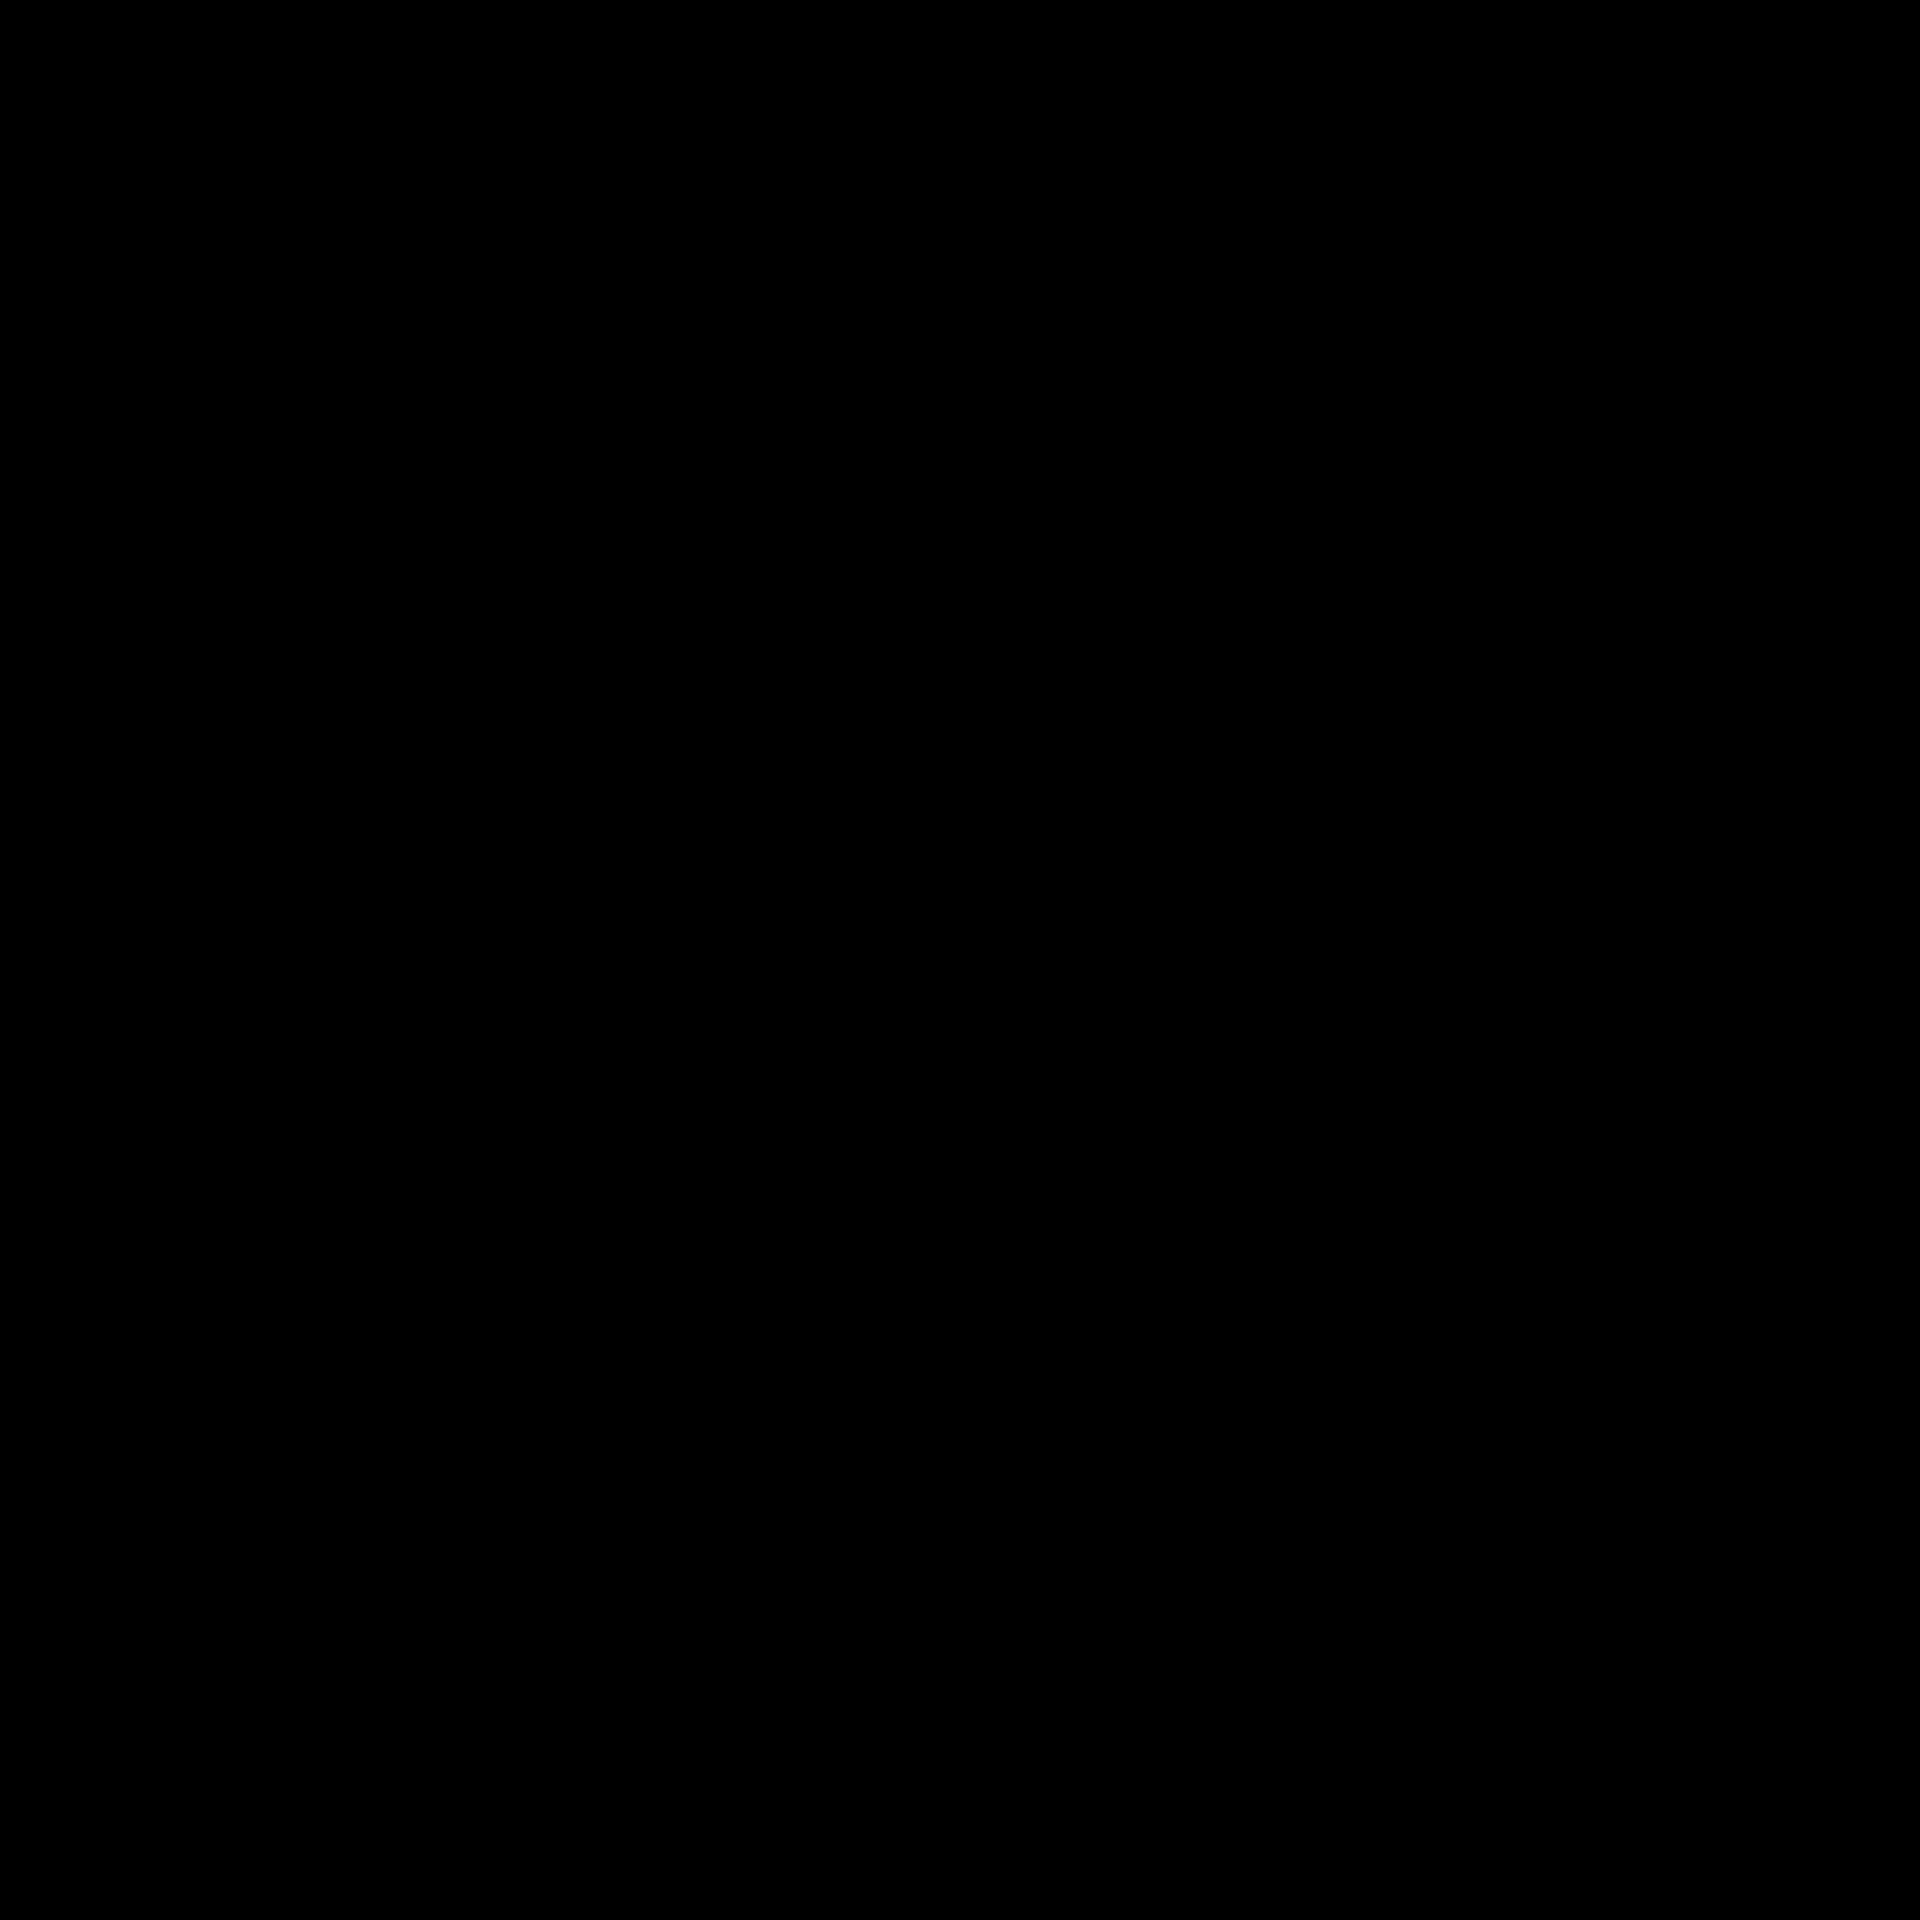 1920x1920 Scale Clipart Legislative